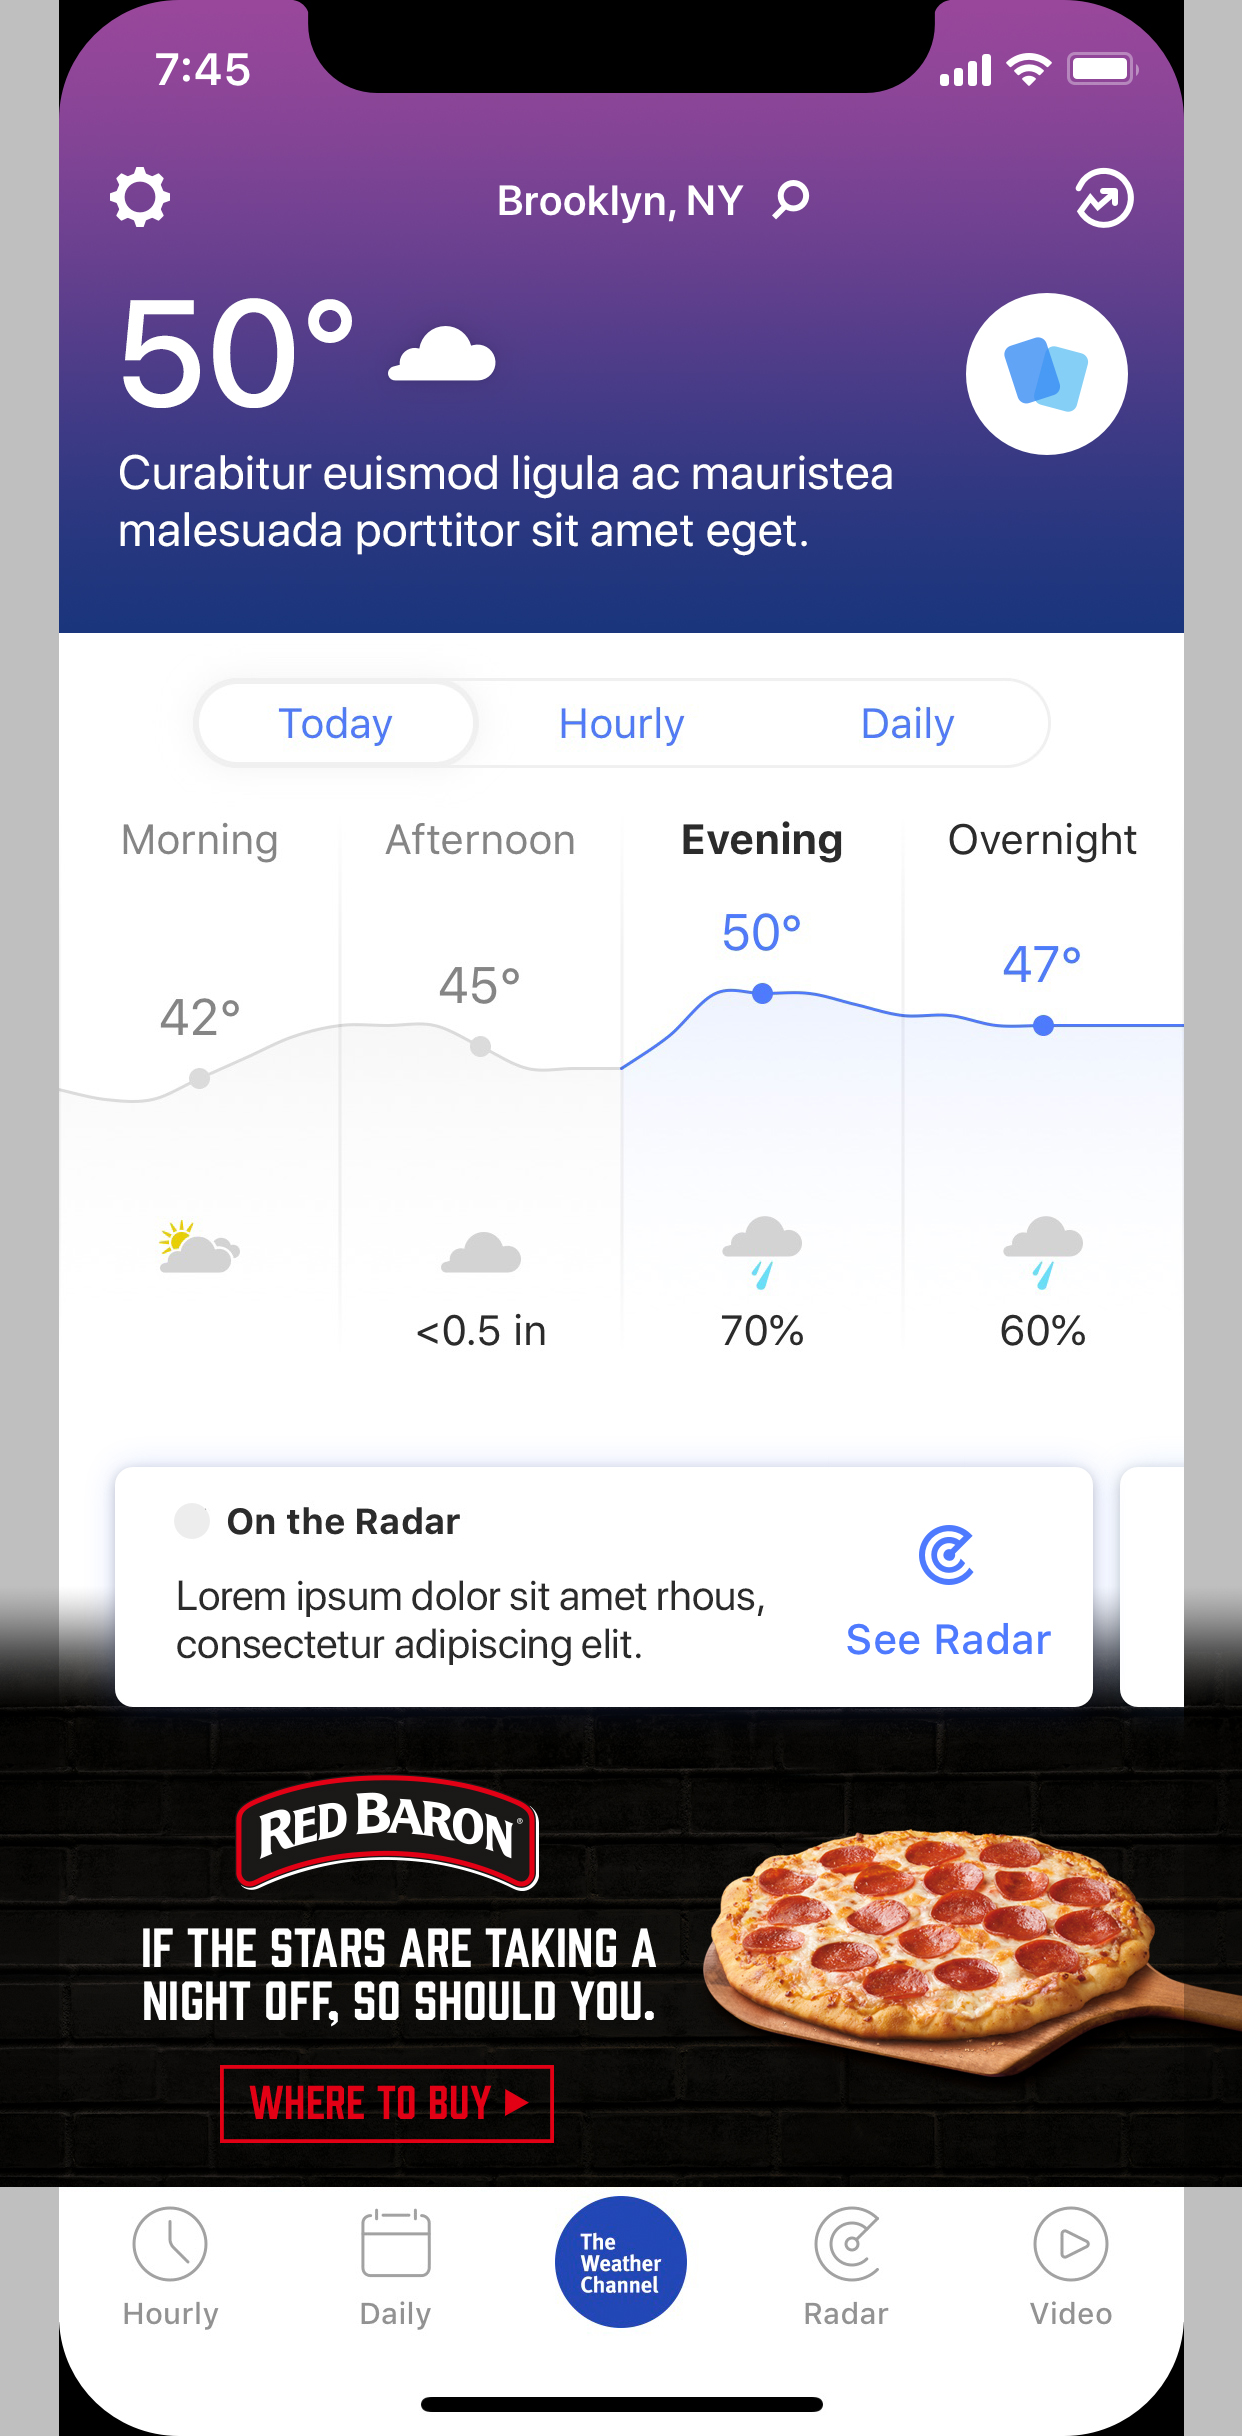 RedBaron_Mobile_LRG_0003_Cloudy Night